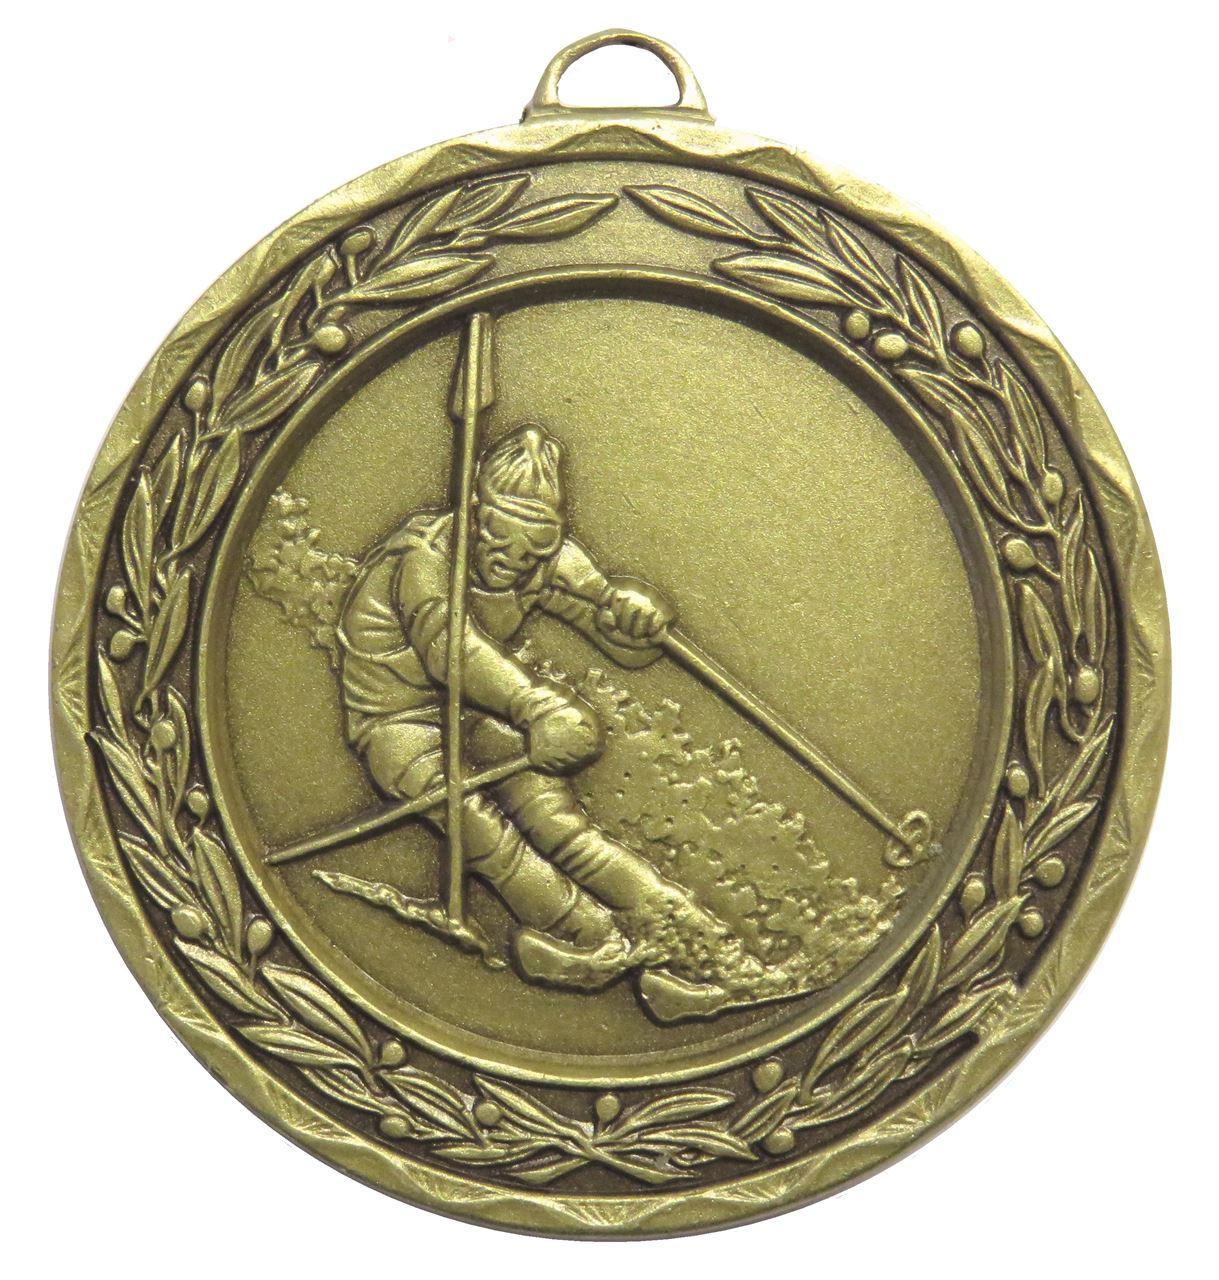 Bronze Laurel Economy Skiing Medal (size: 50mm) - 9806E